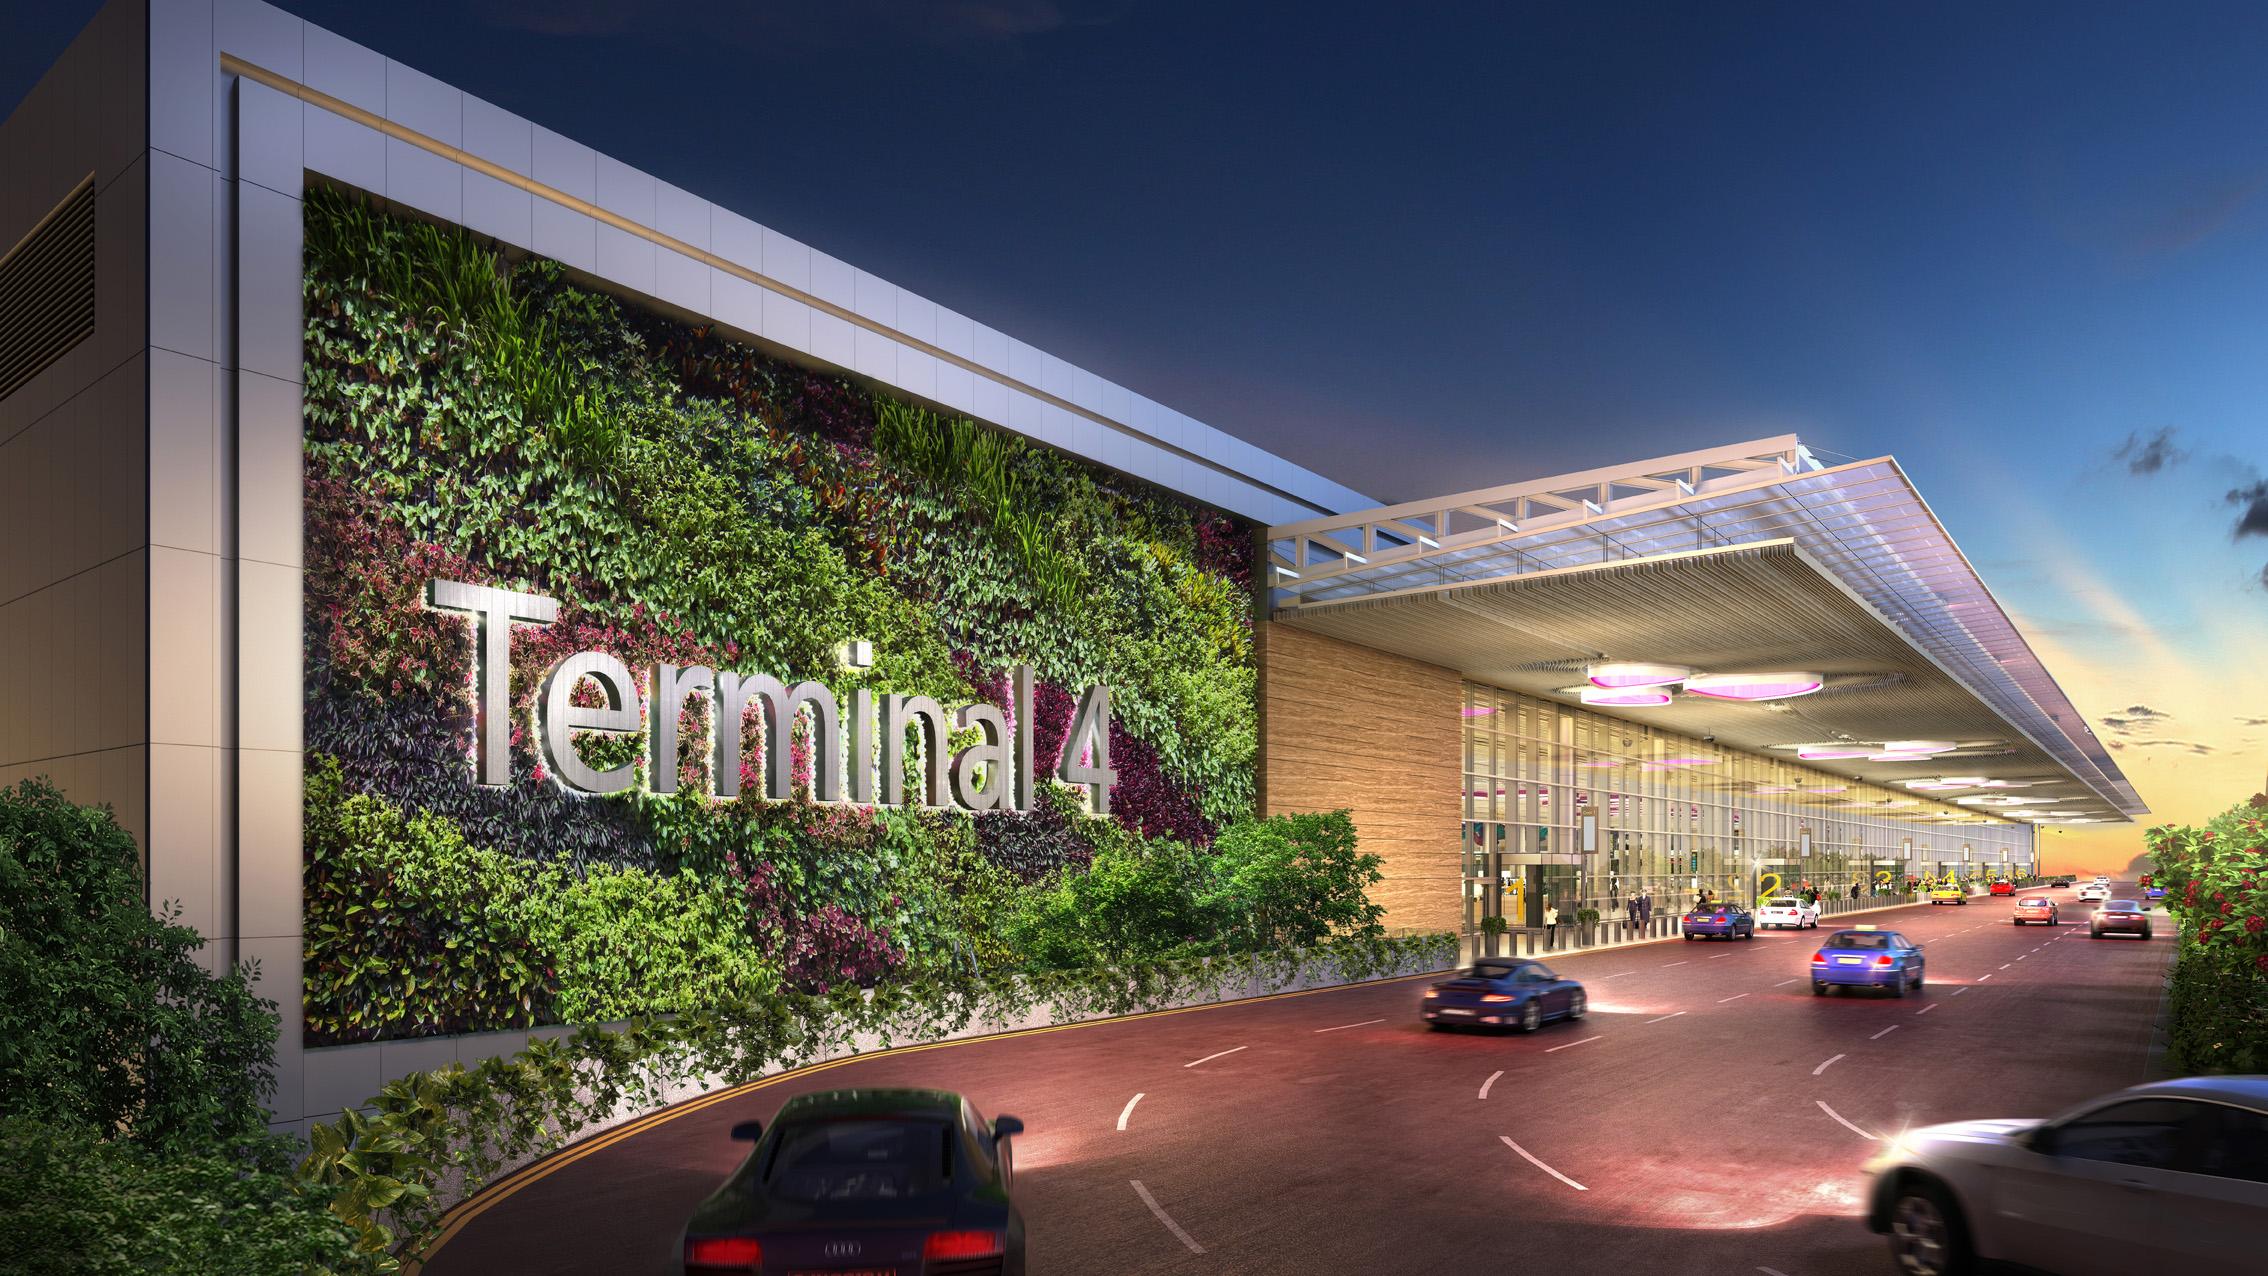 Photo courtesy: Changi Airport Group